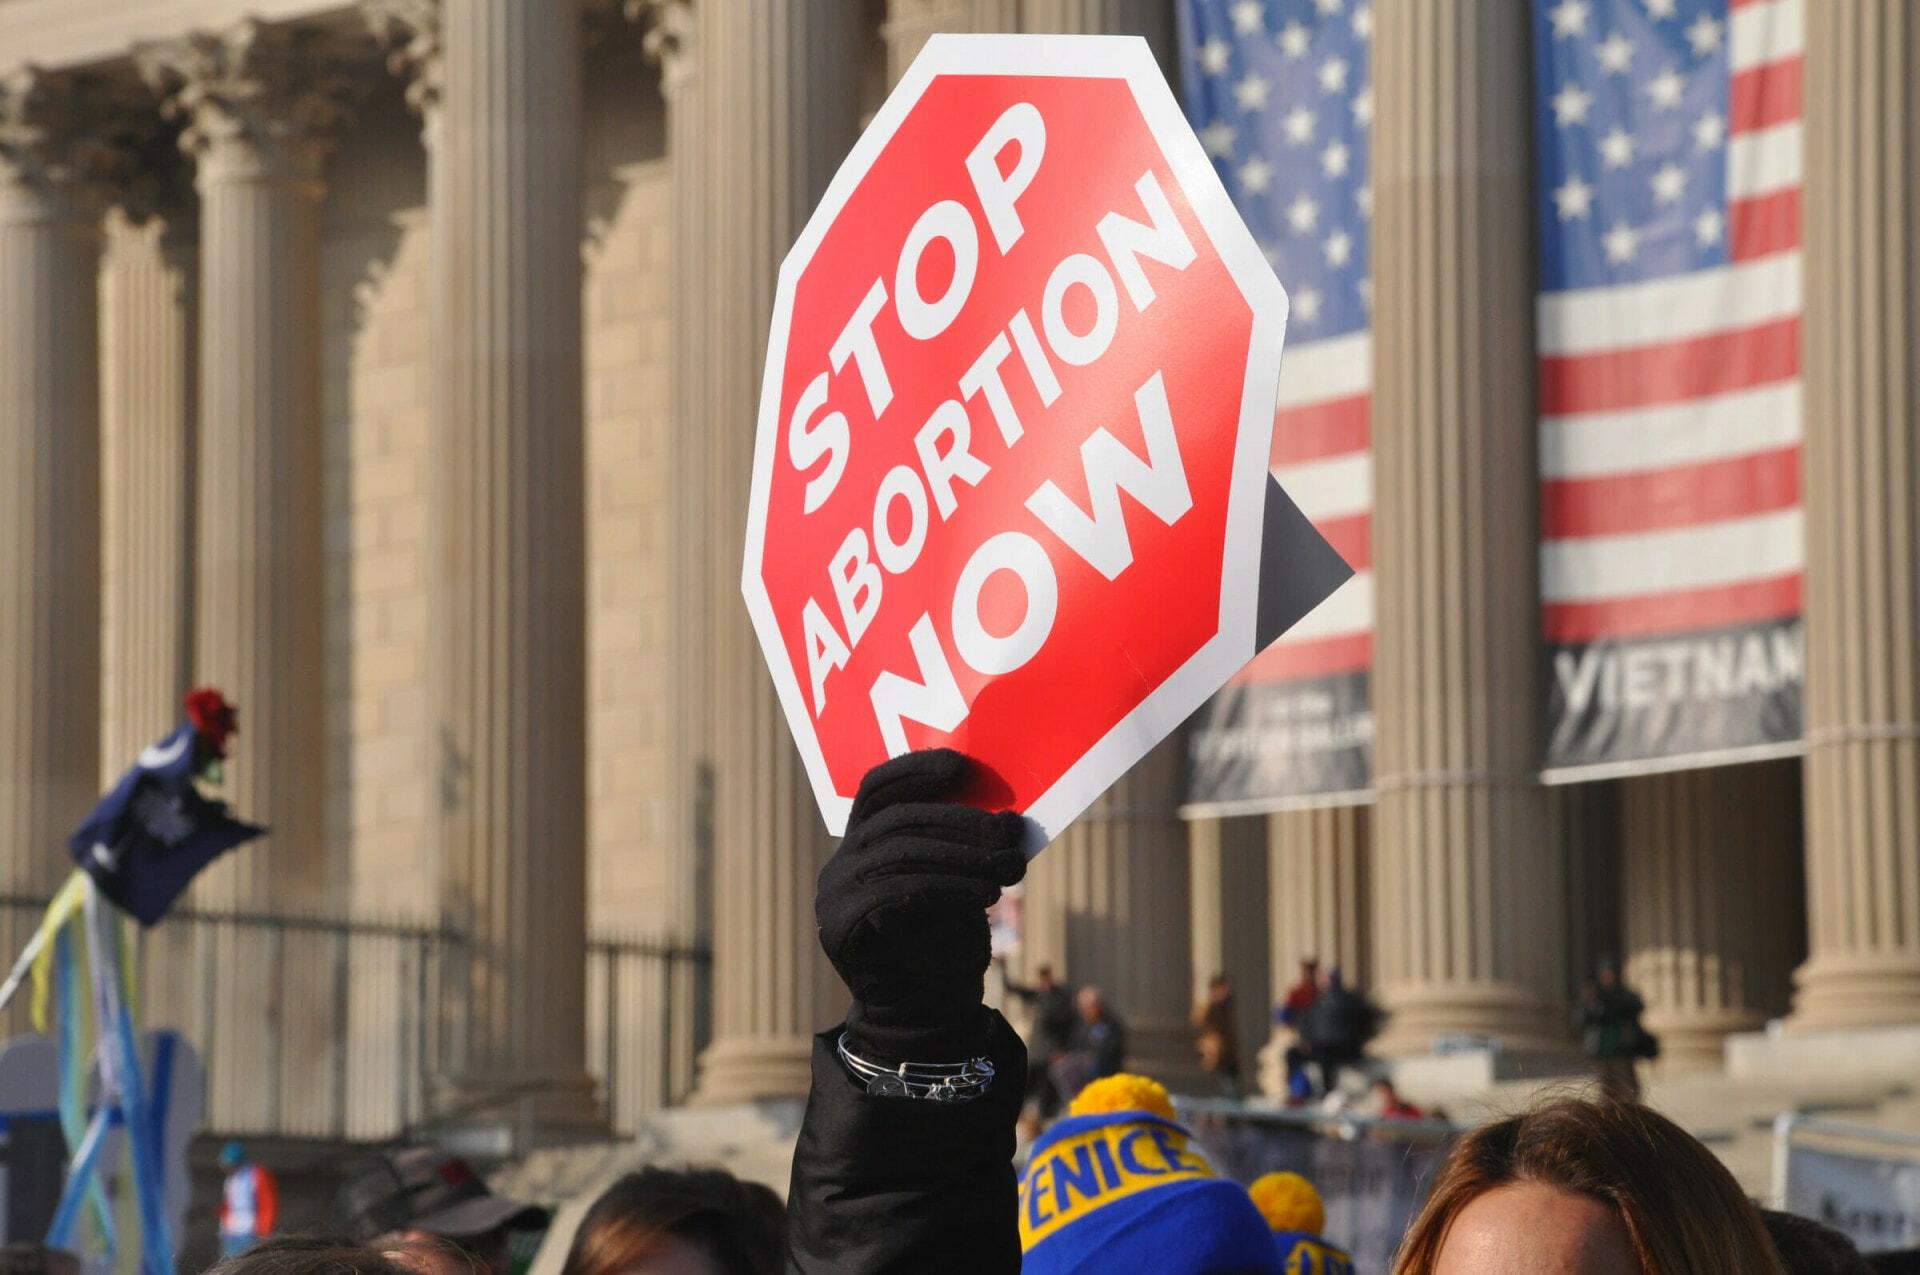 Pro-life, anti-abortion protester